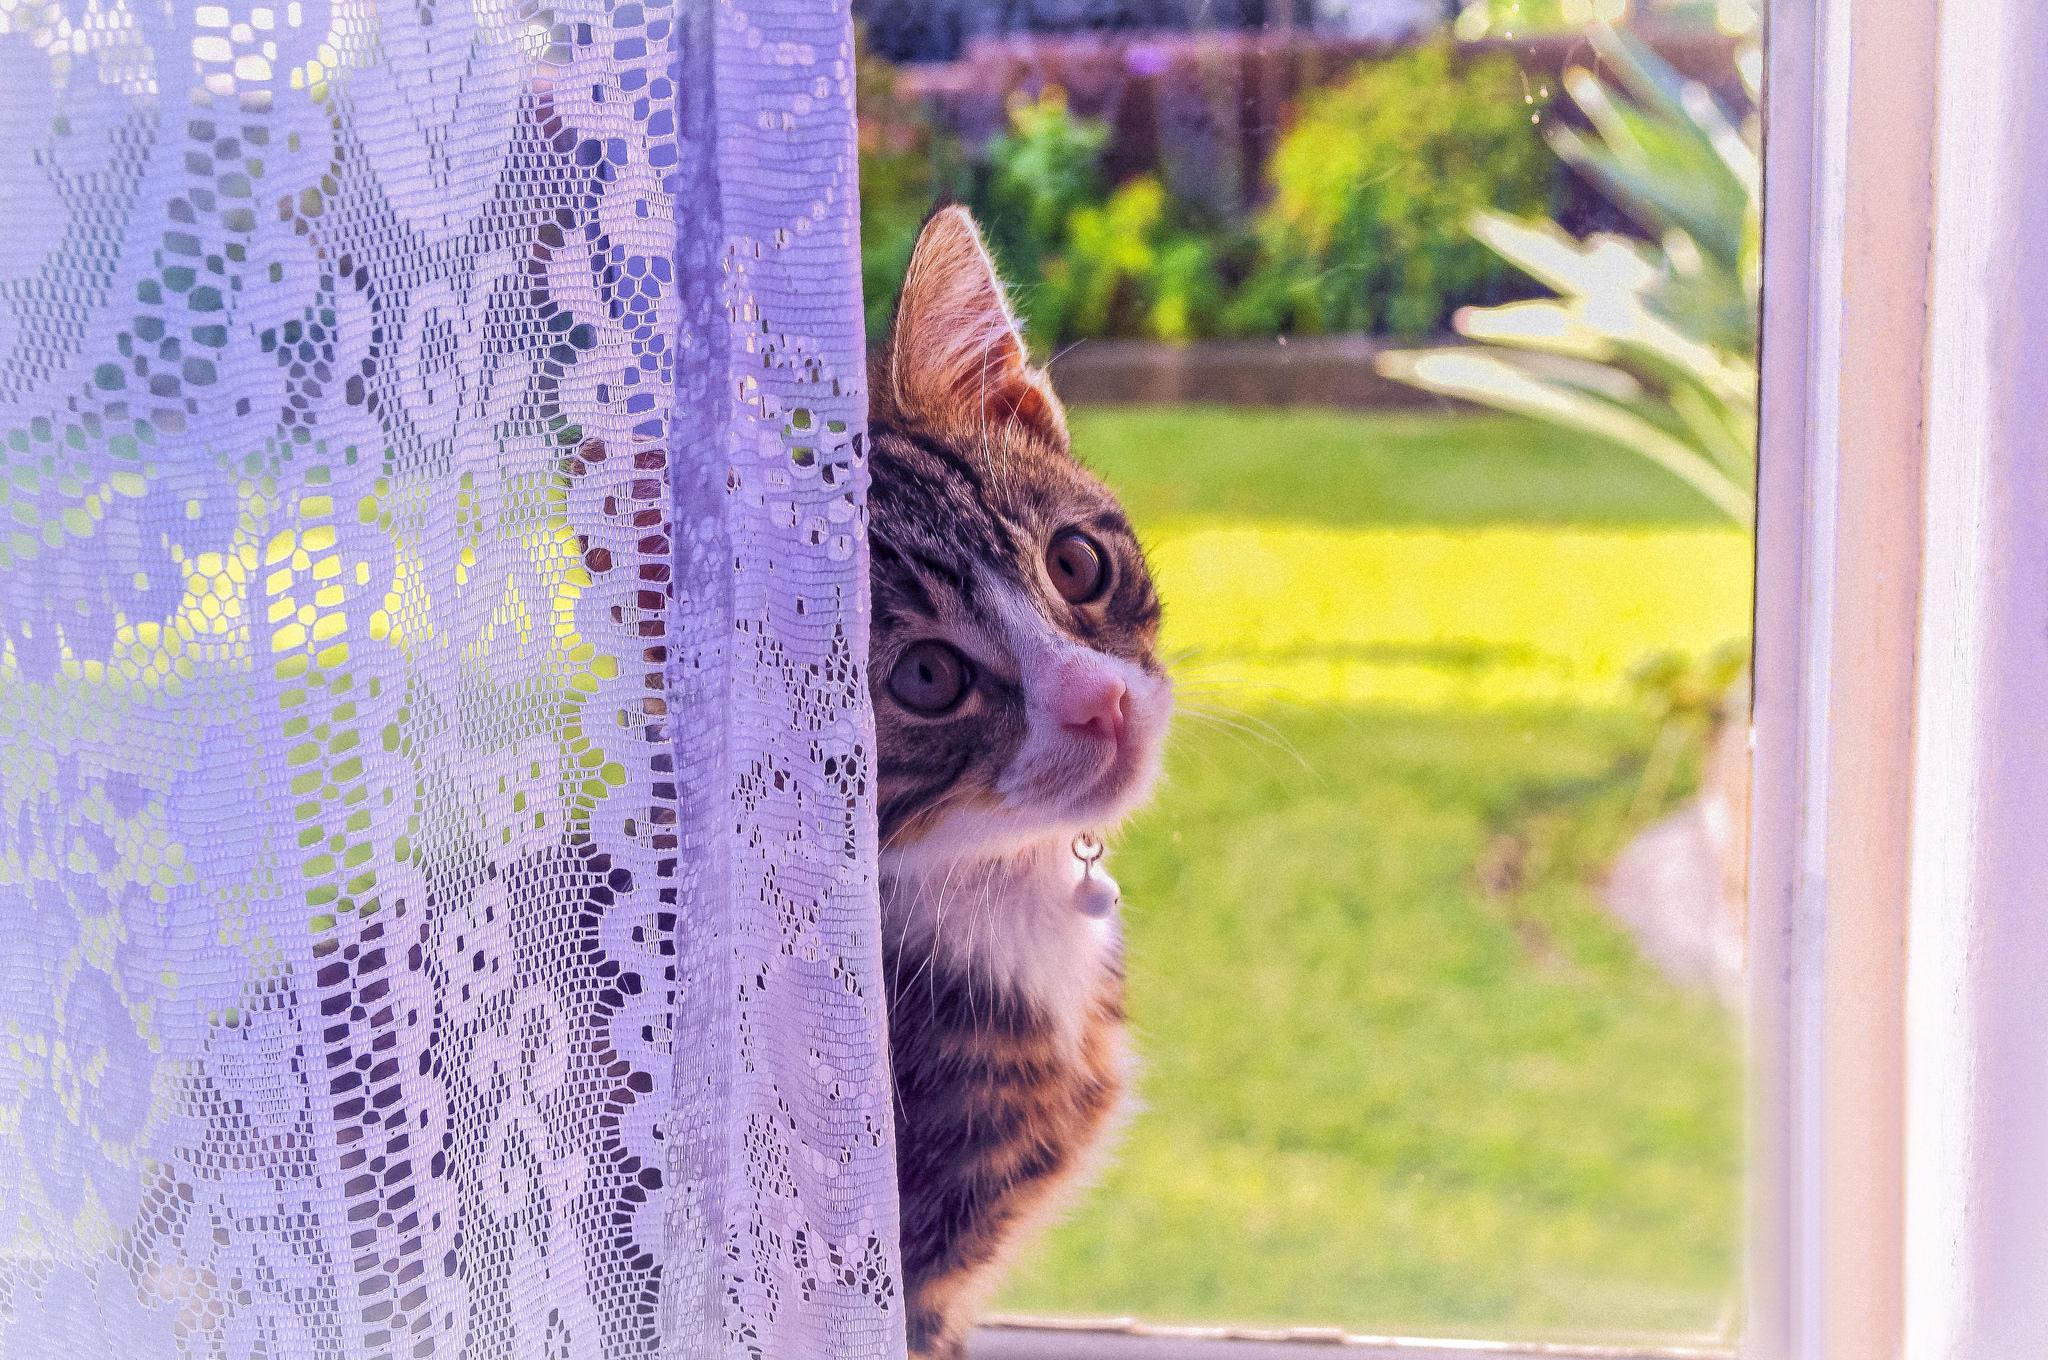 котята на окне kittens on the window  № 3063250 бесплатно